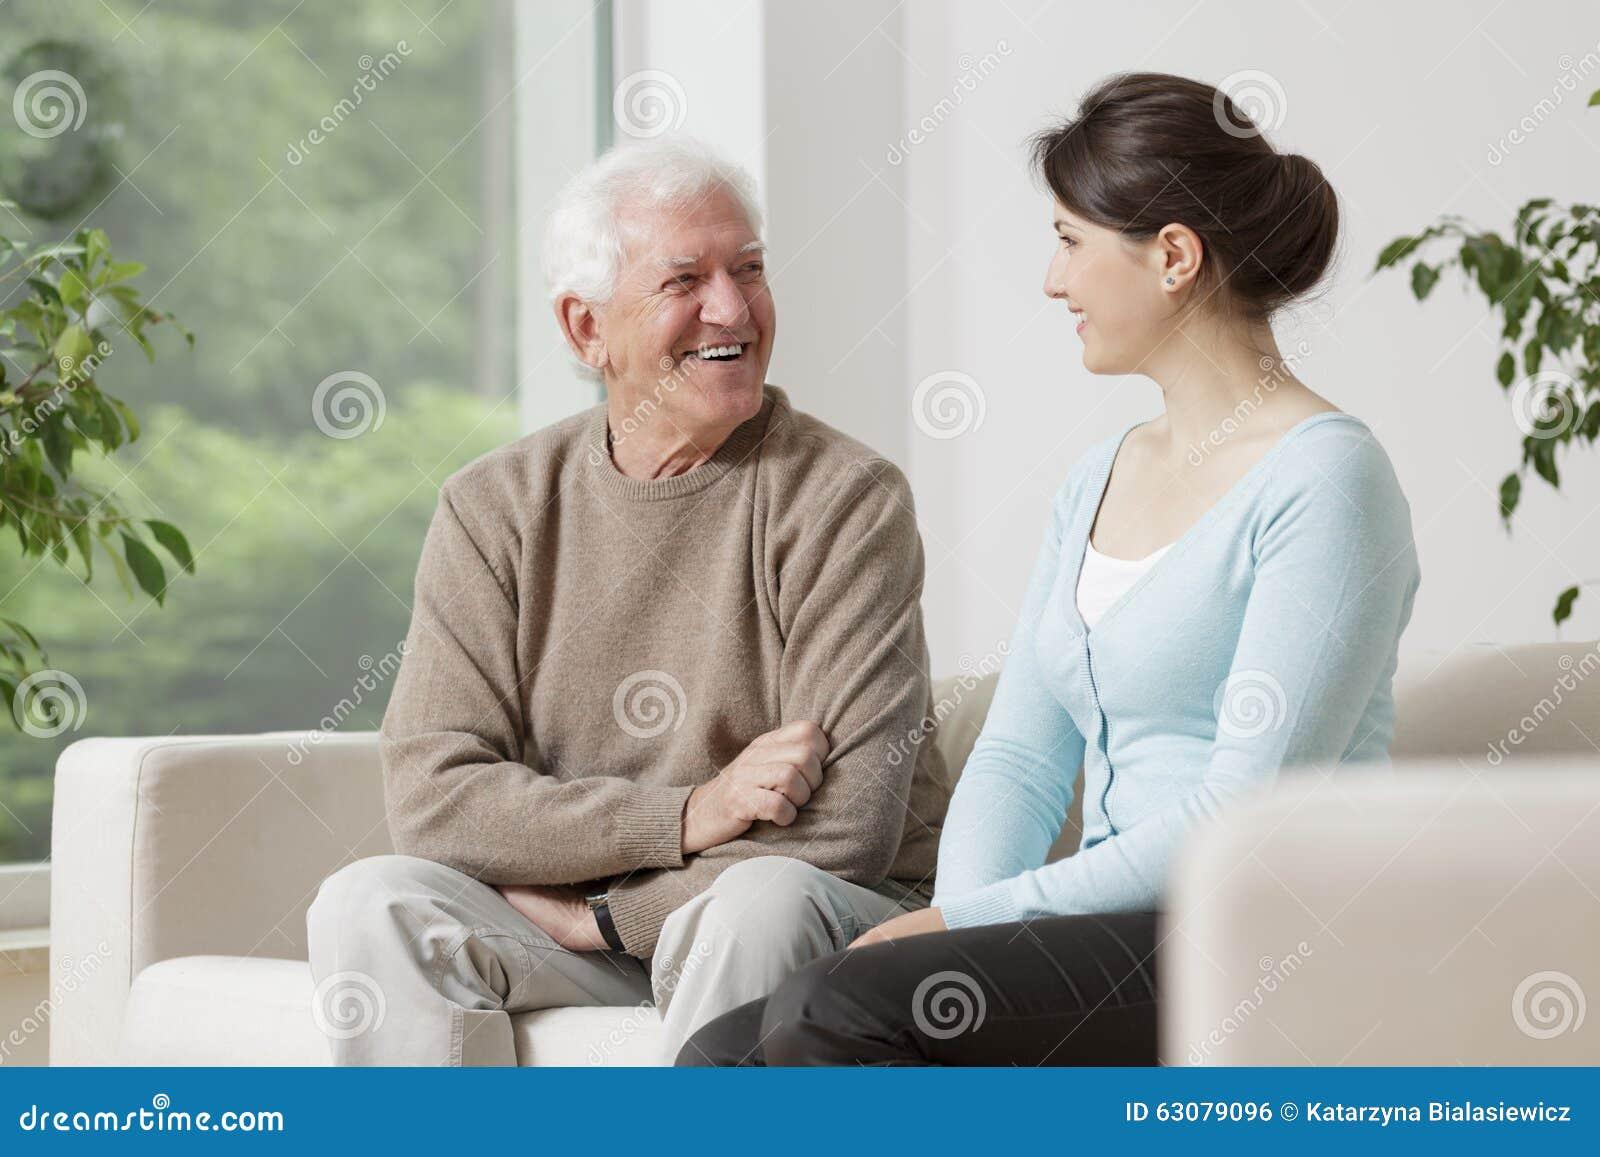 Partnersuche alter mann junge frau